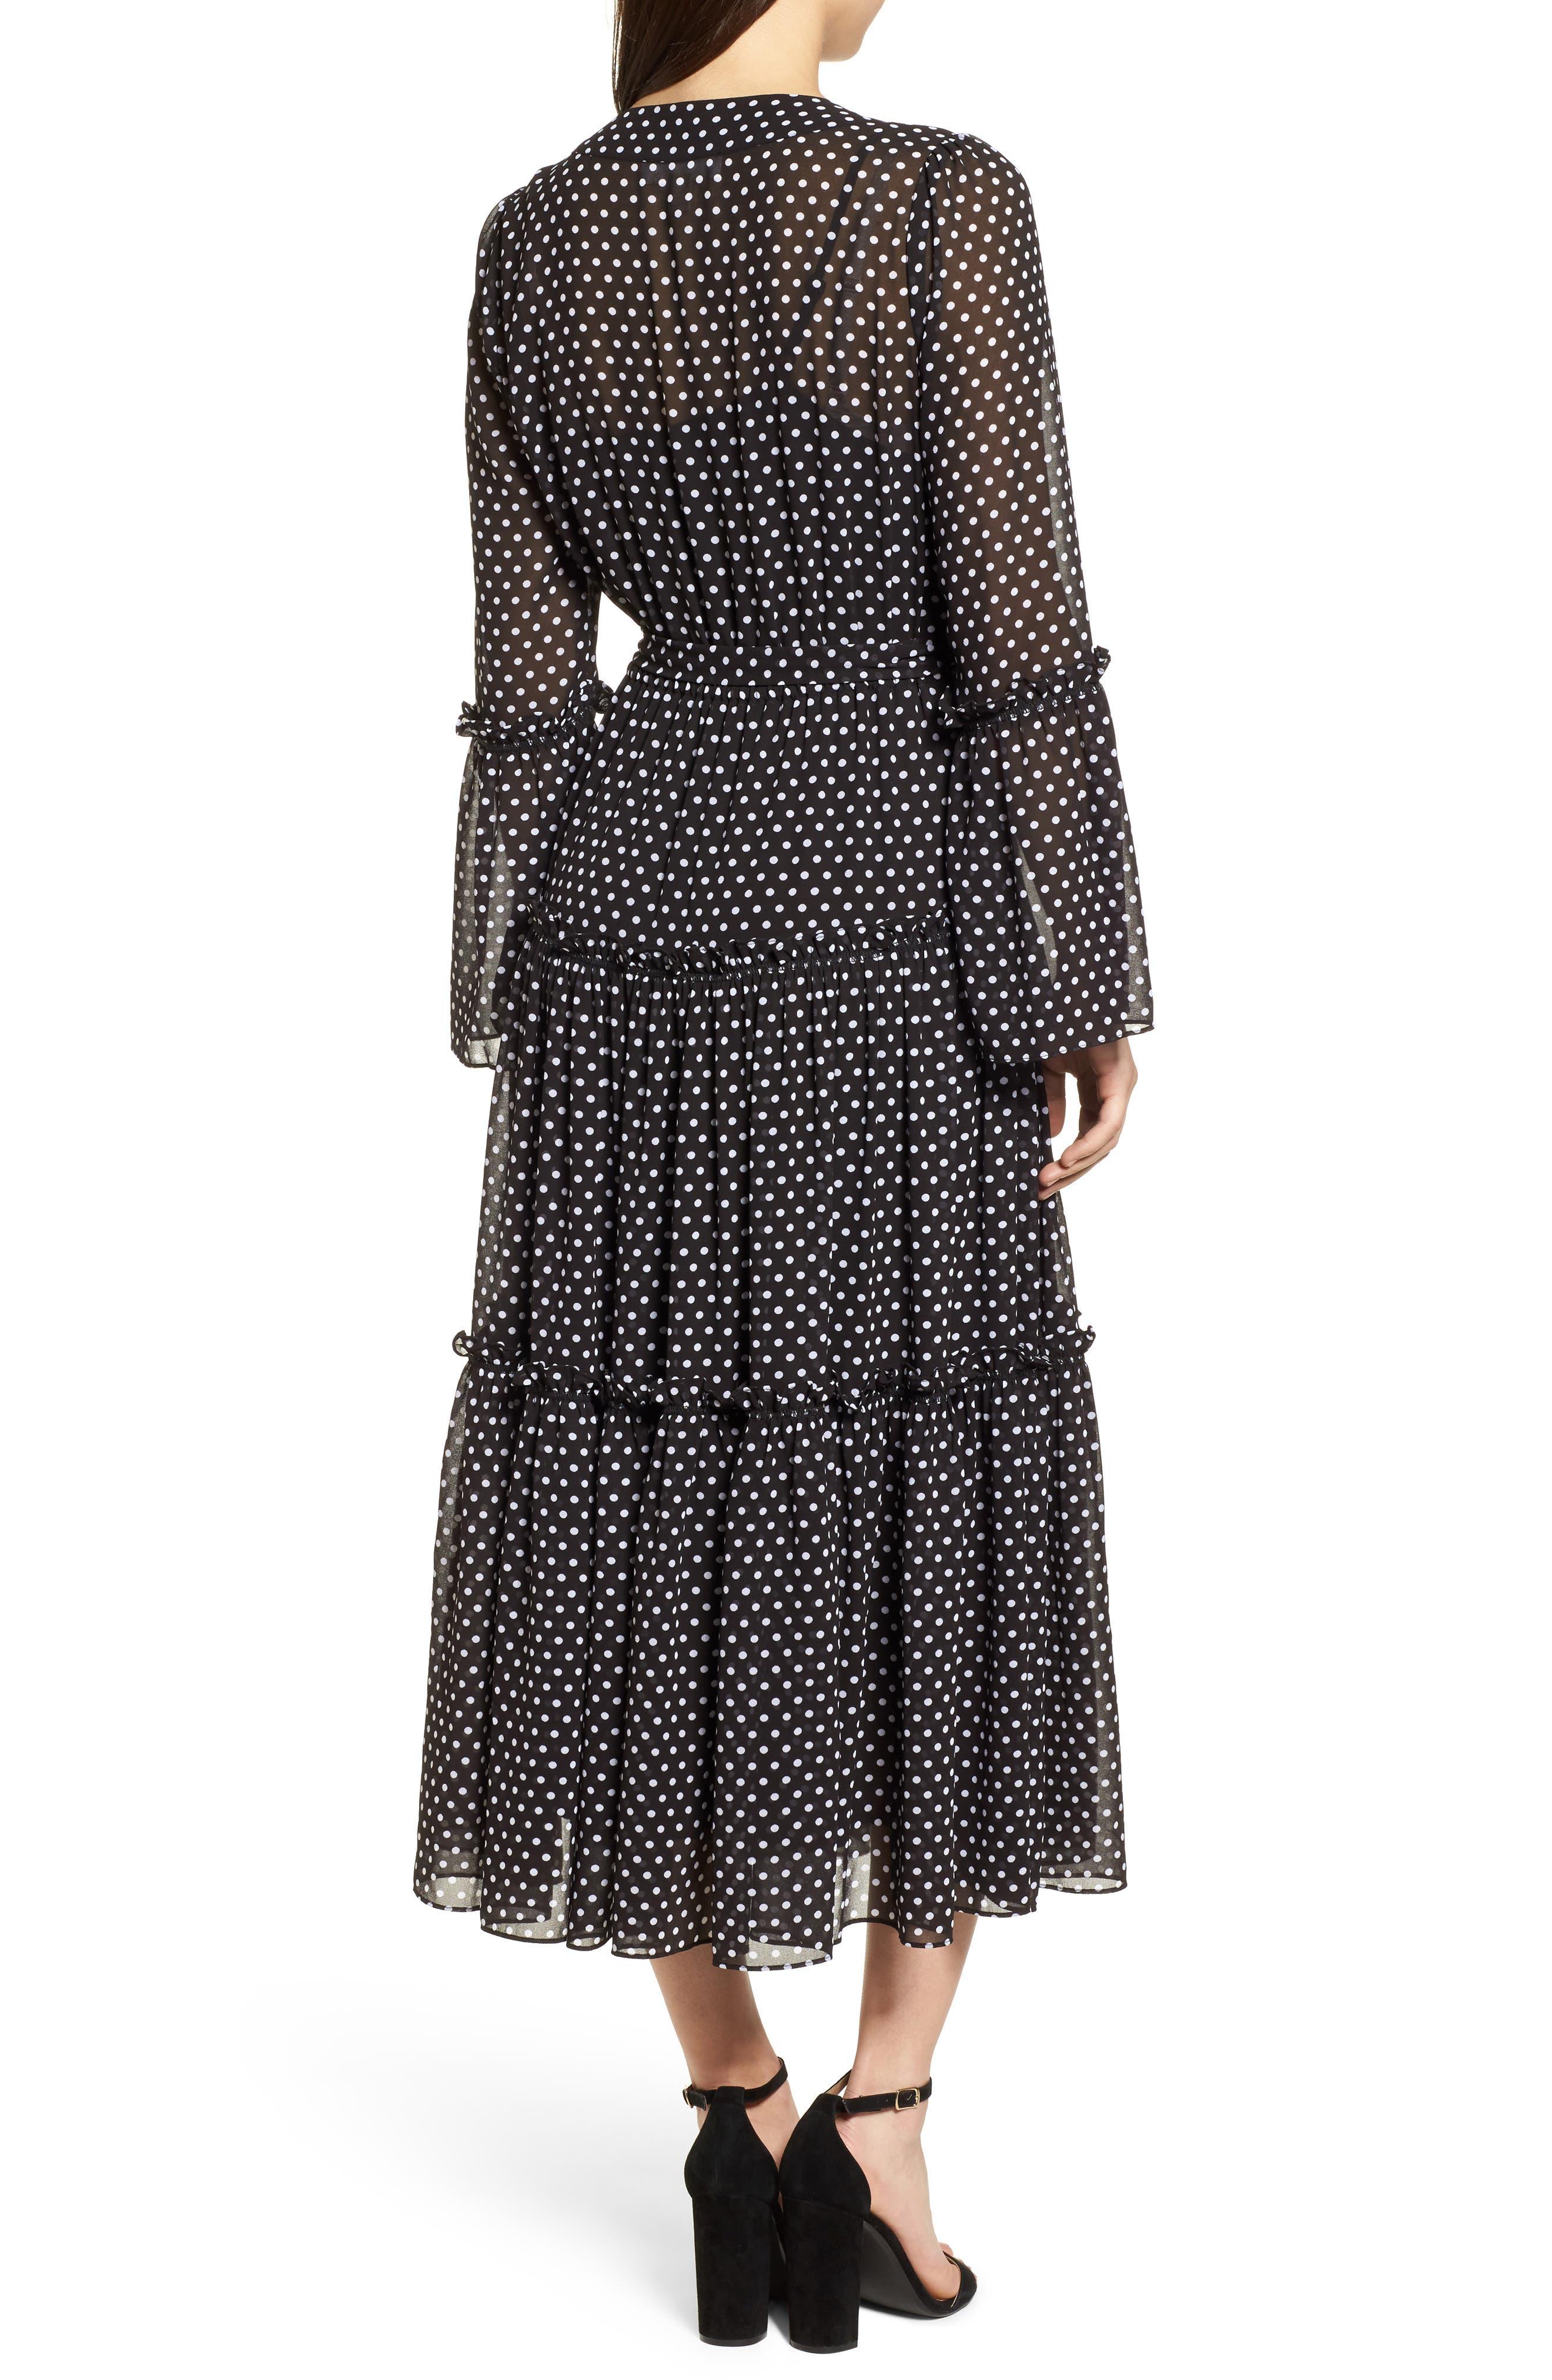 Tiered Dot Boho Dress,                             Alternate thumbnail 2, color,                             Black/ White